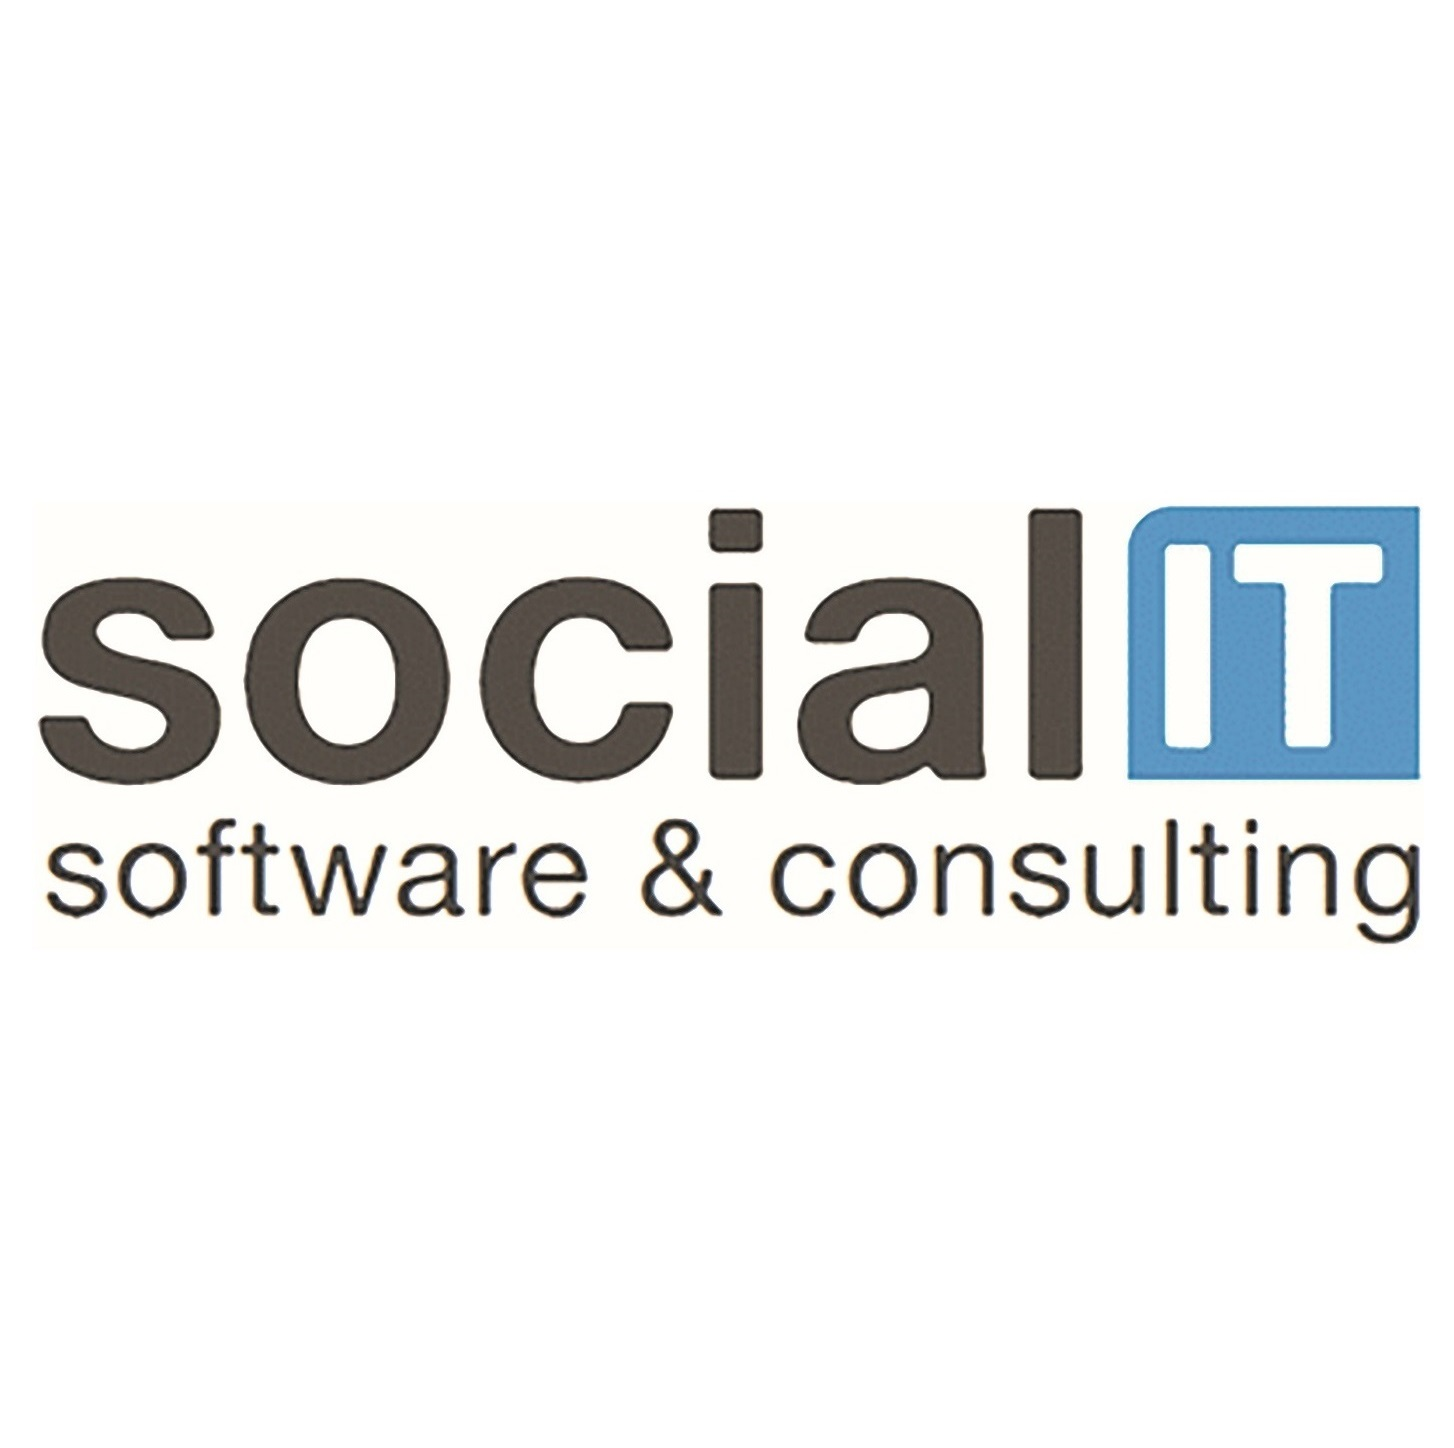 SocialIT